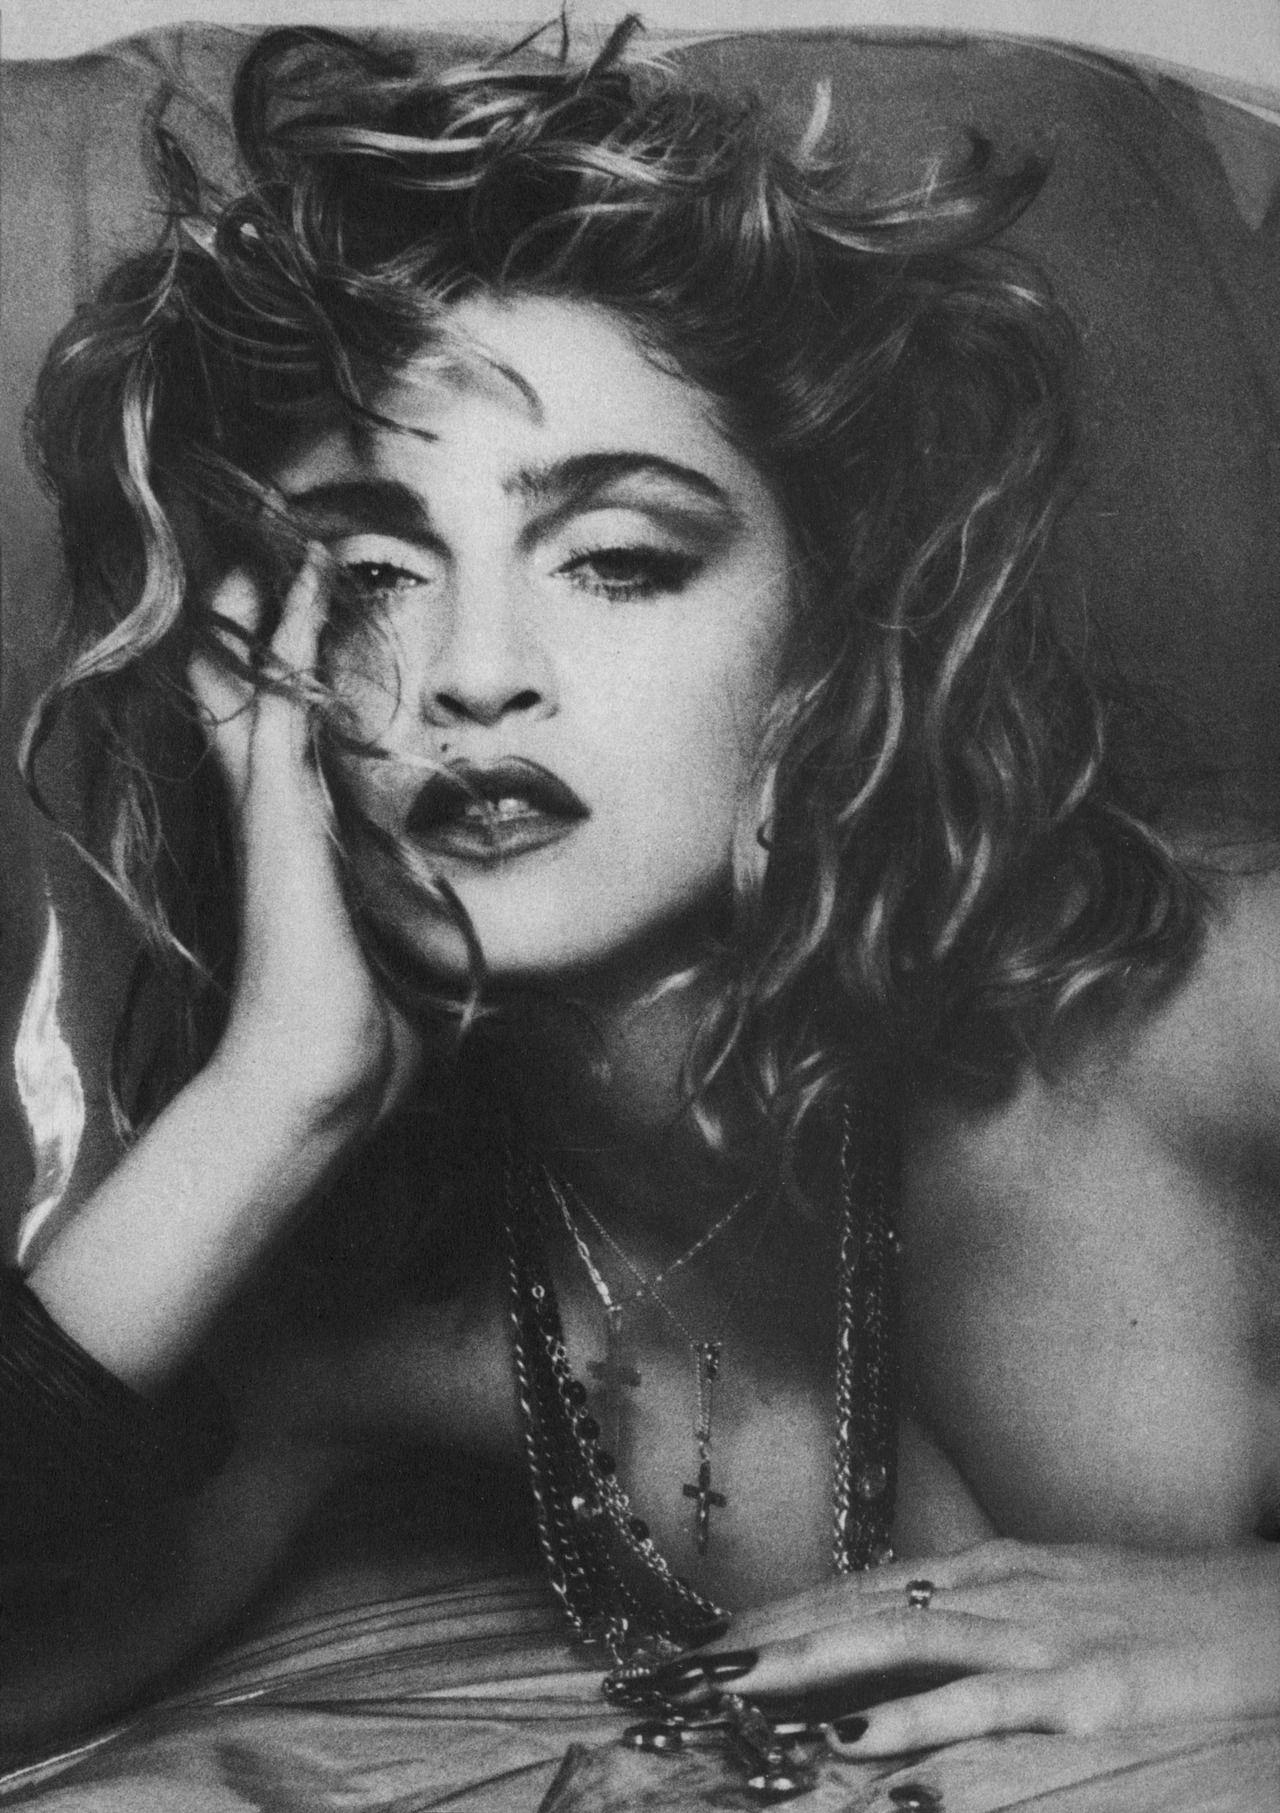 Pud Whacker's Madonna Scrapbook Tumblr: Photo